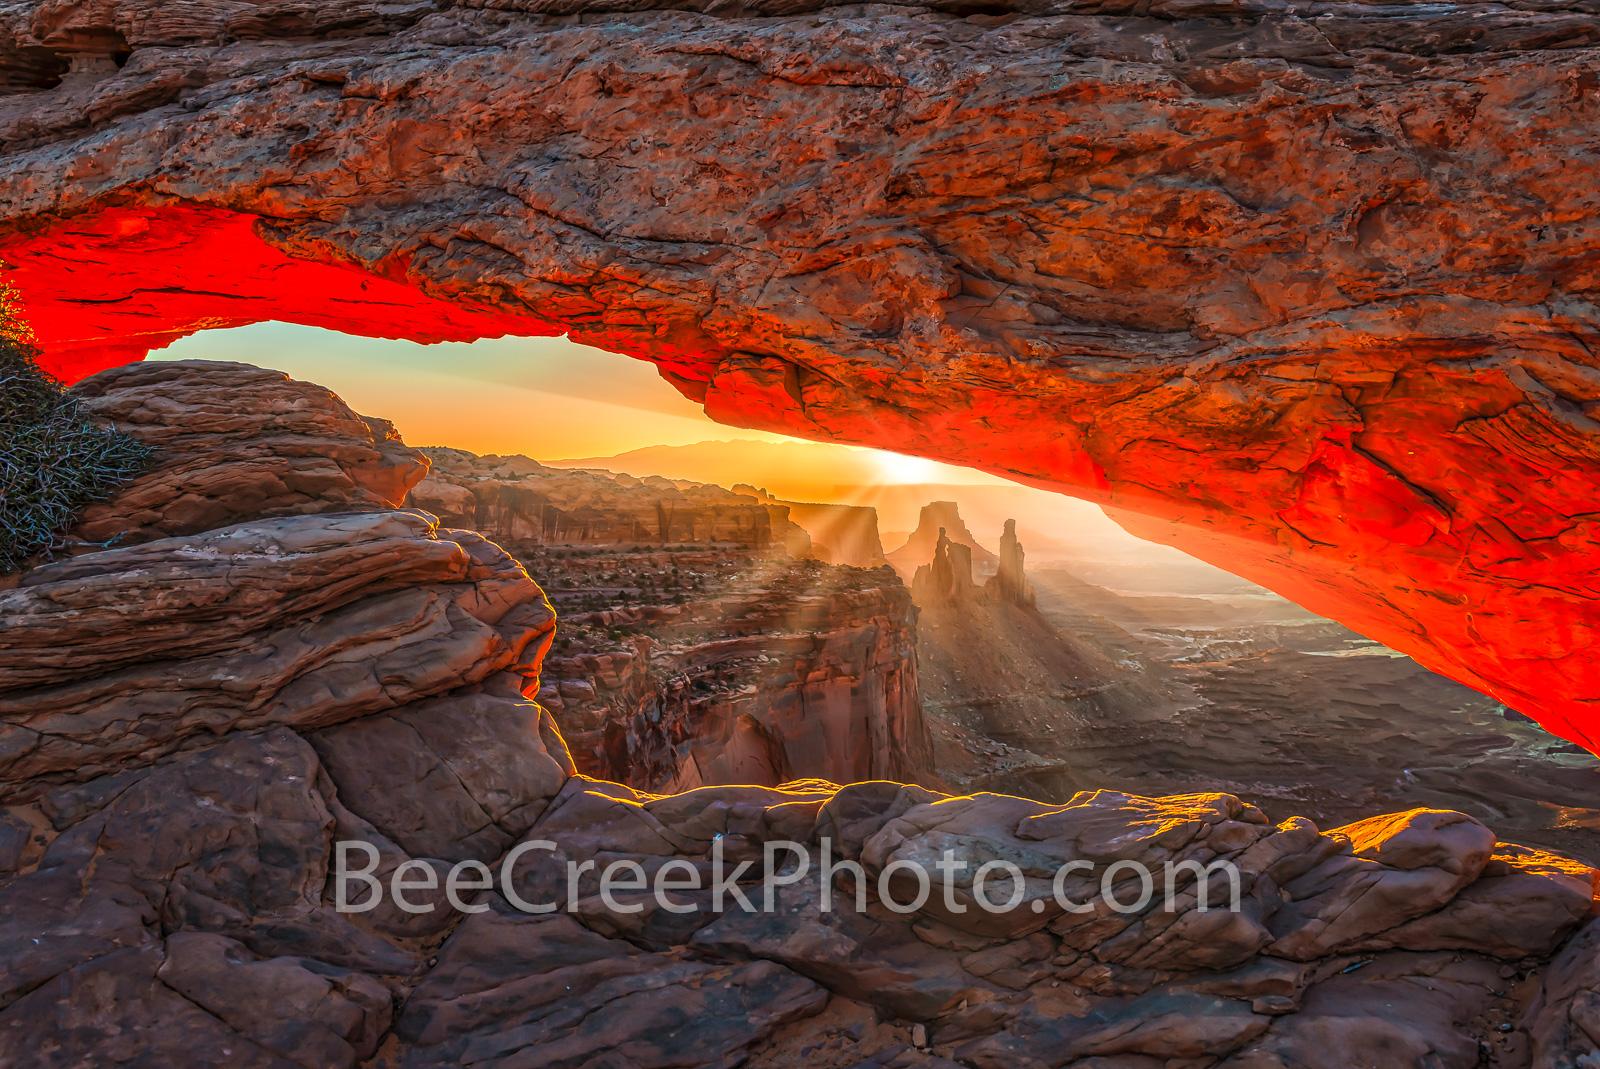 Canyonland, Mesa Arch, Mountains, National Park, Sunrise, UT, Utal, canyons, desert southwest, geologic, geology, glow, landscape, landscapes, red, rocks, rocky, scenic, view, window, photo